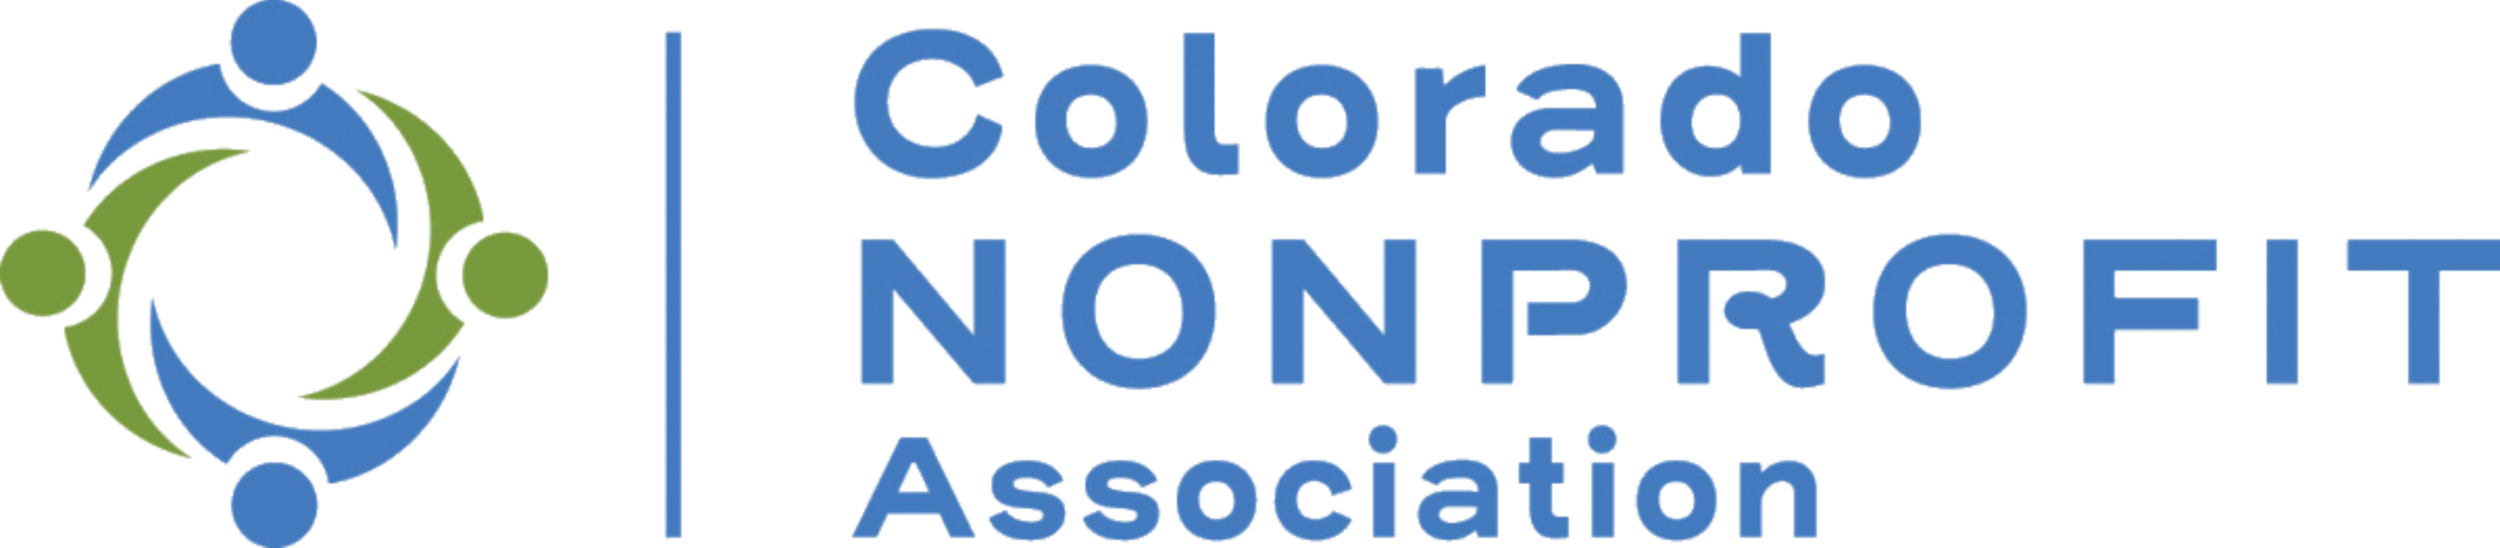 colorado nonprofit association.png